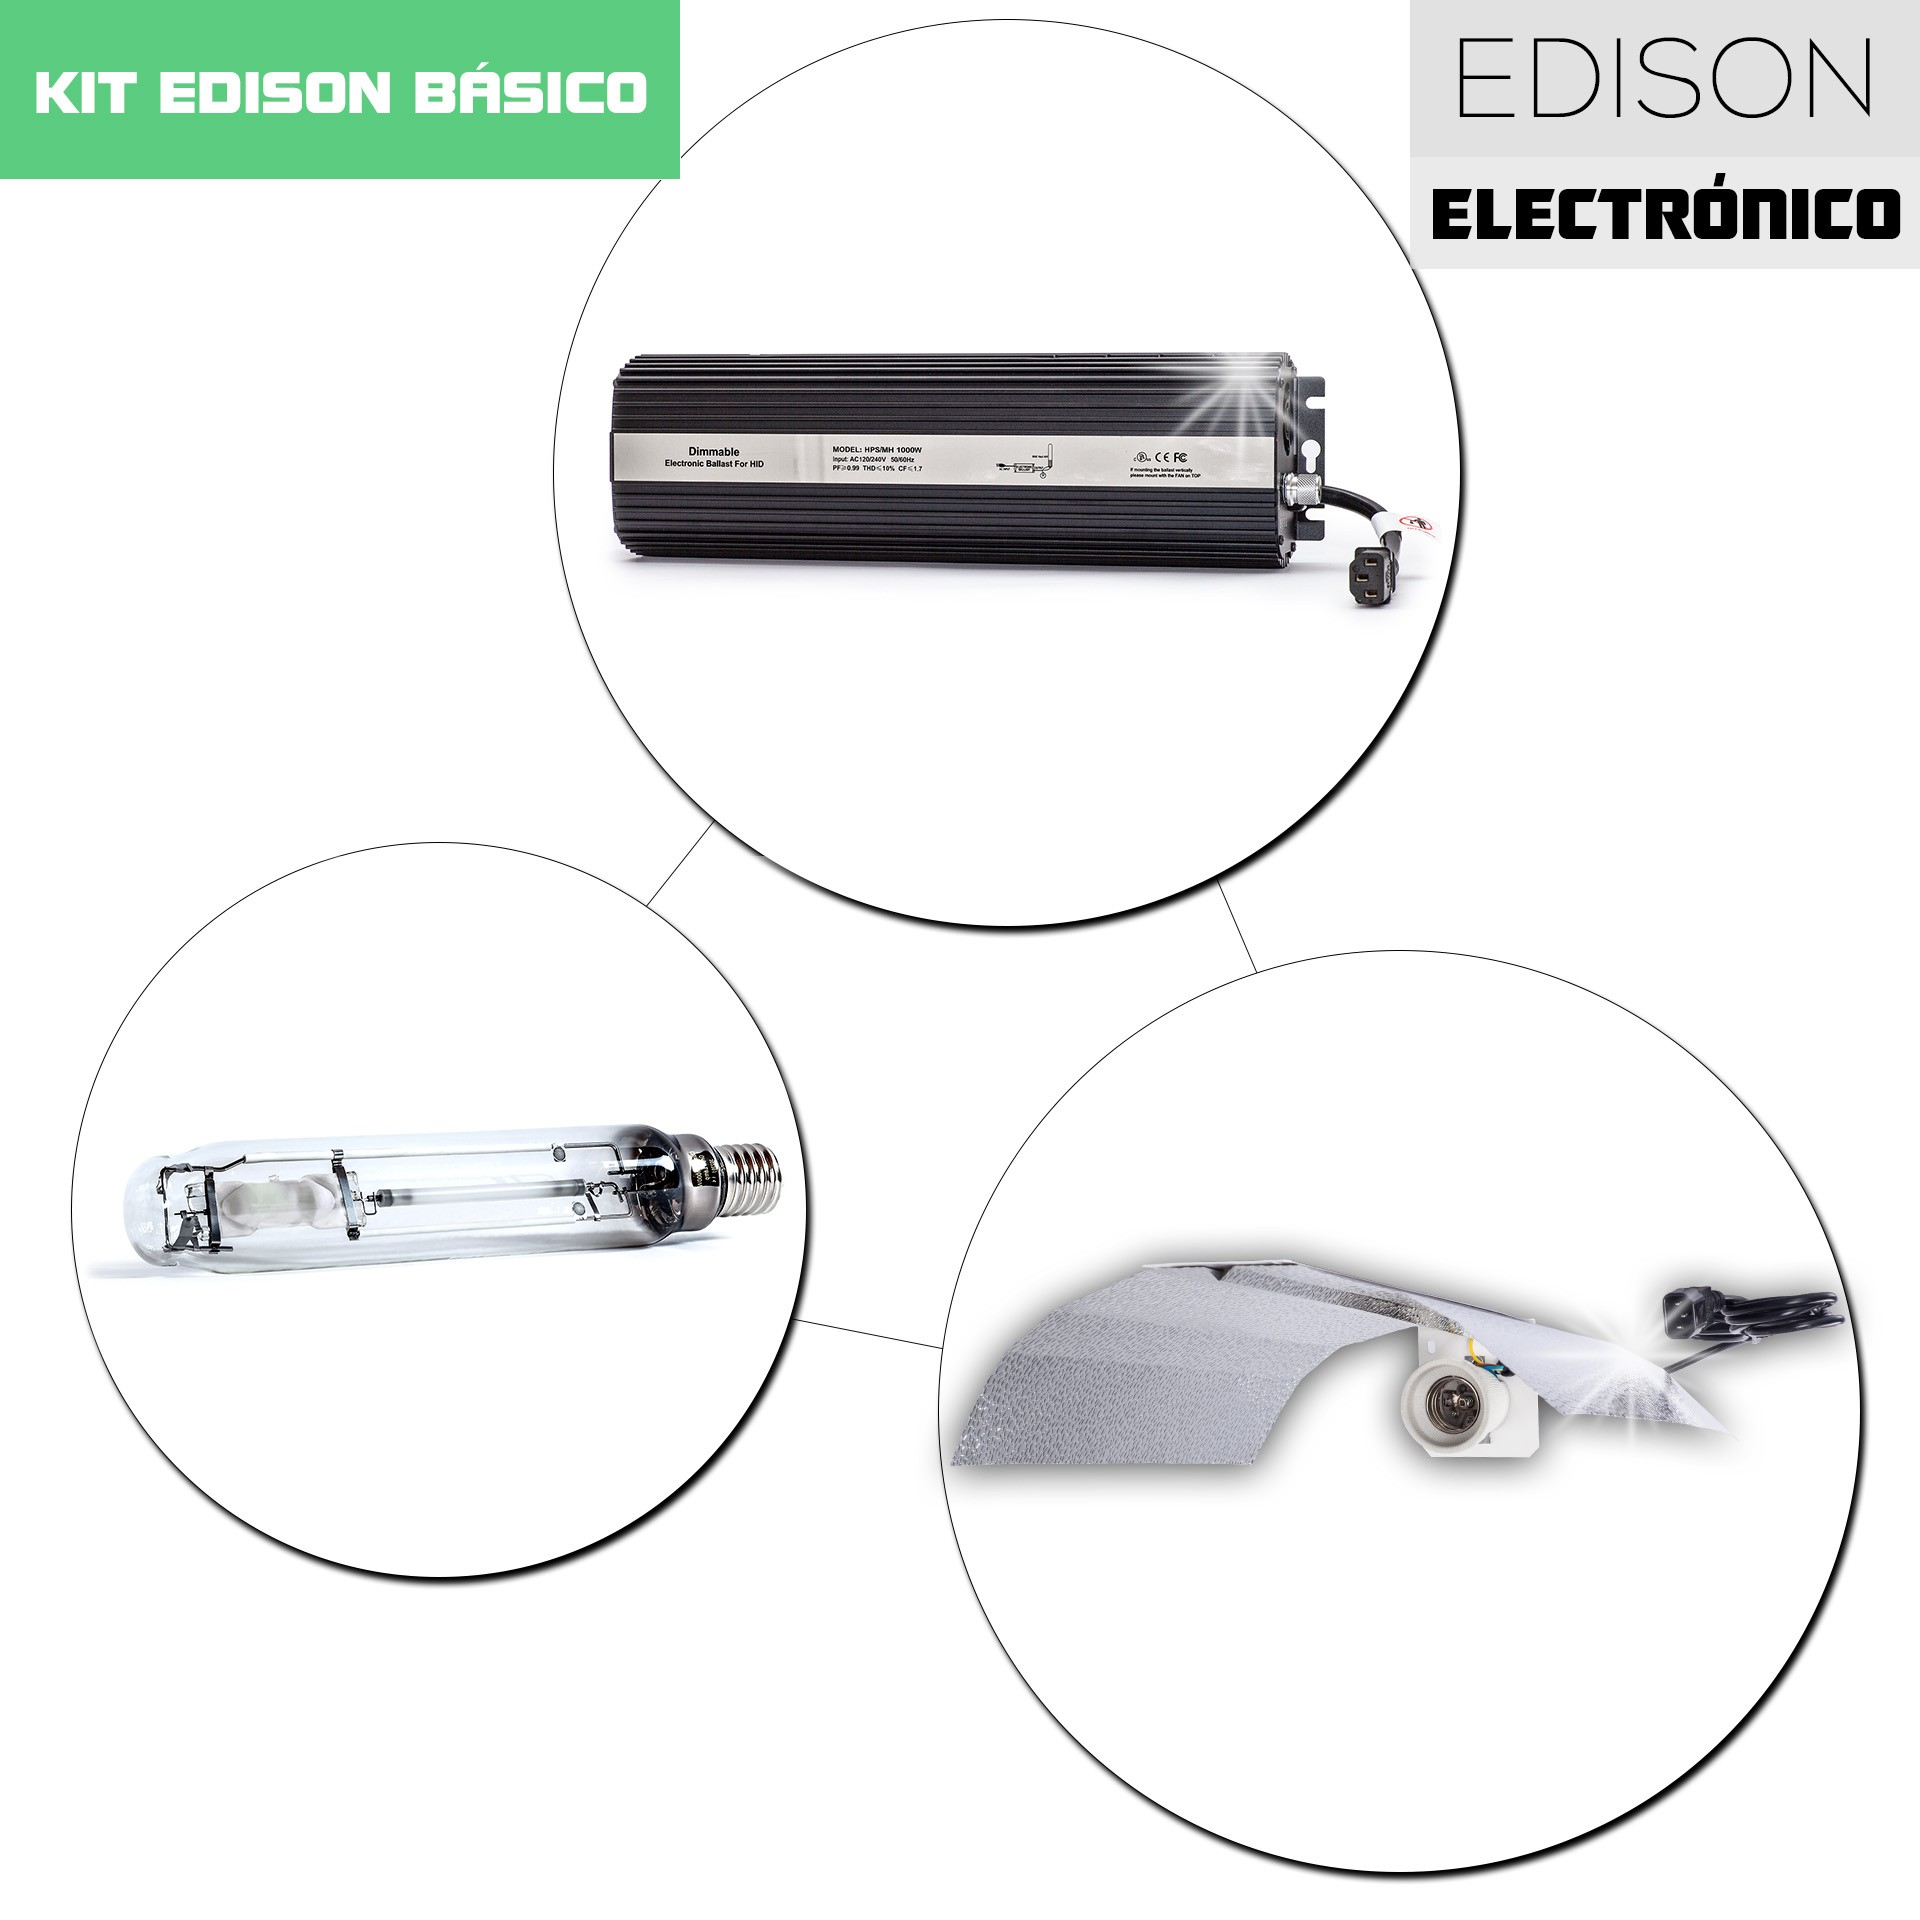 Kit Edison Electrónico 1000W Arco Dual